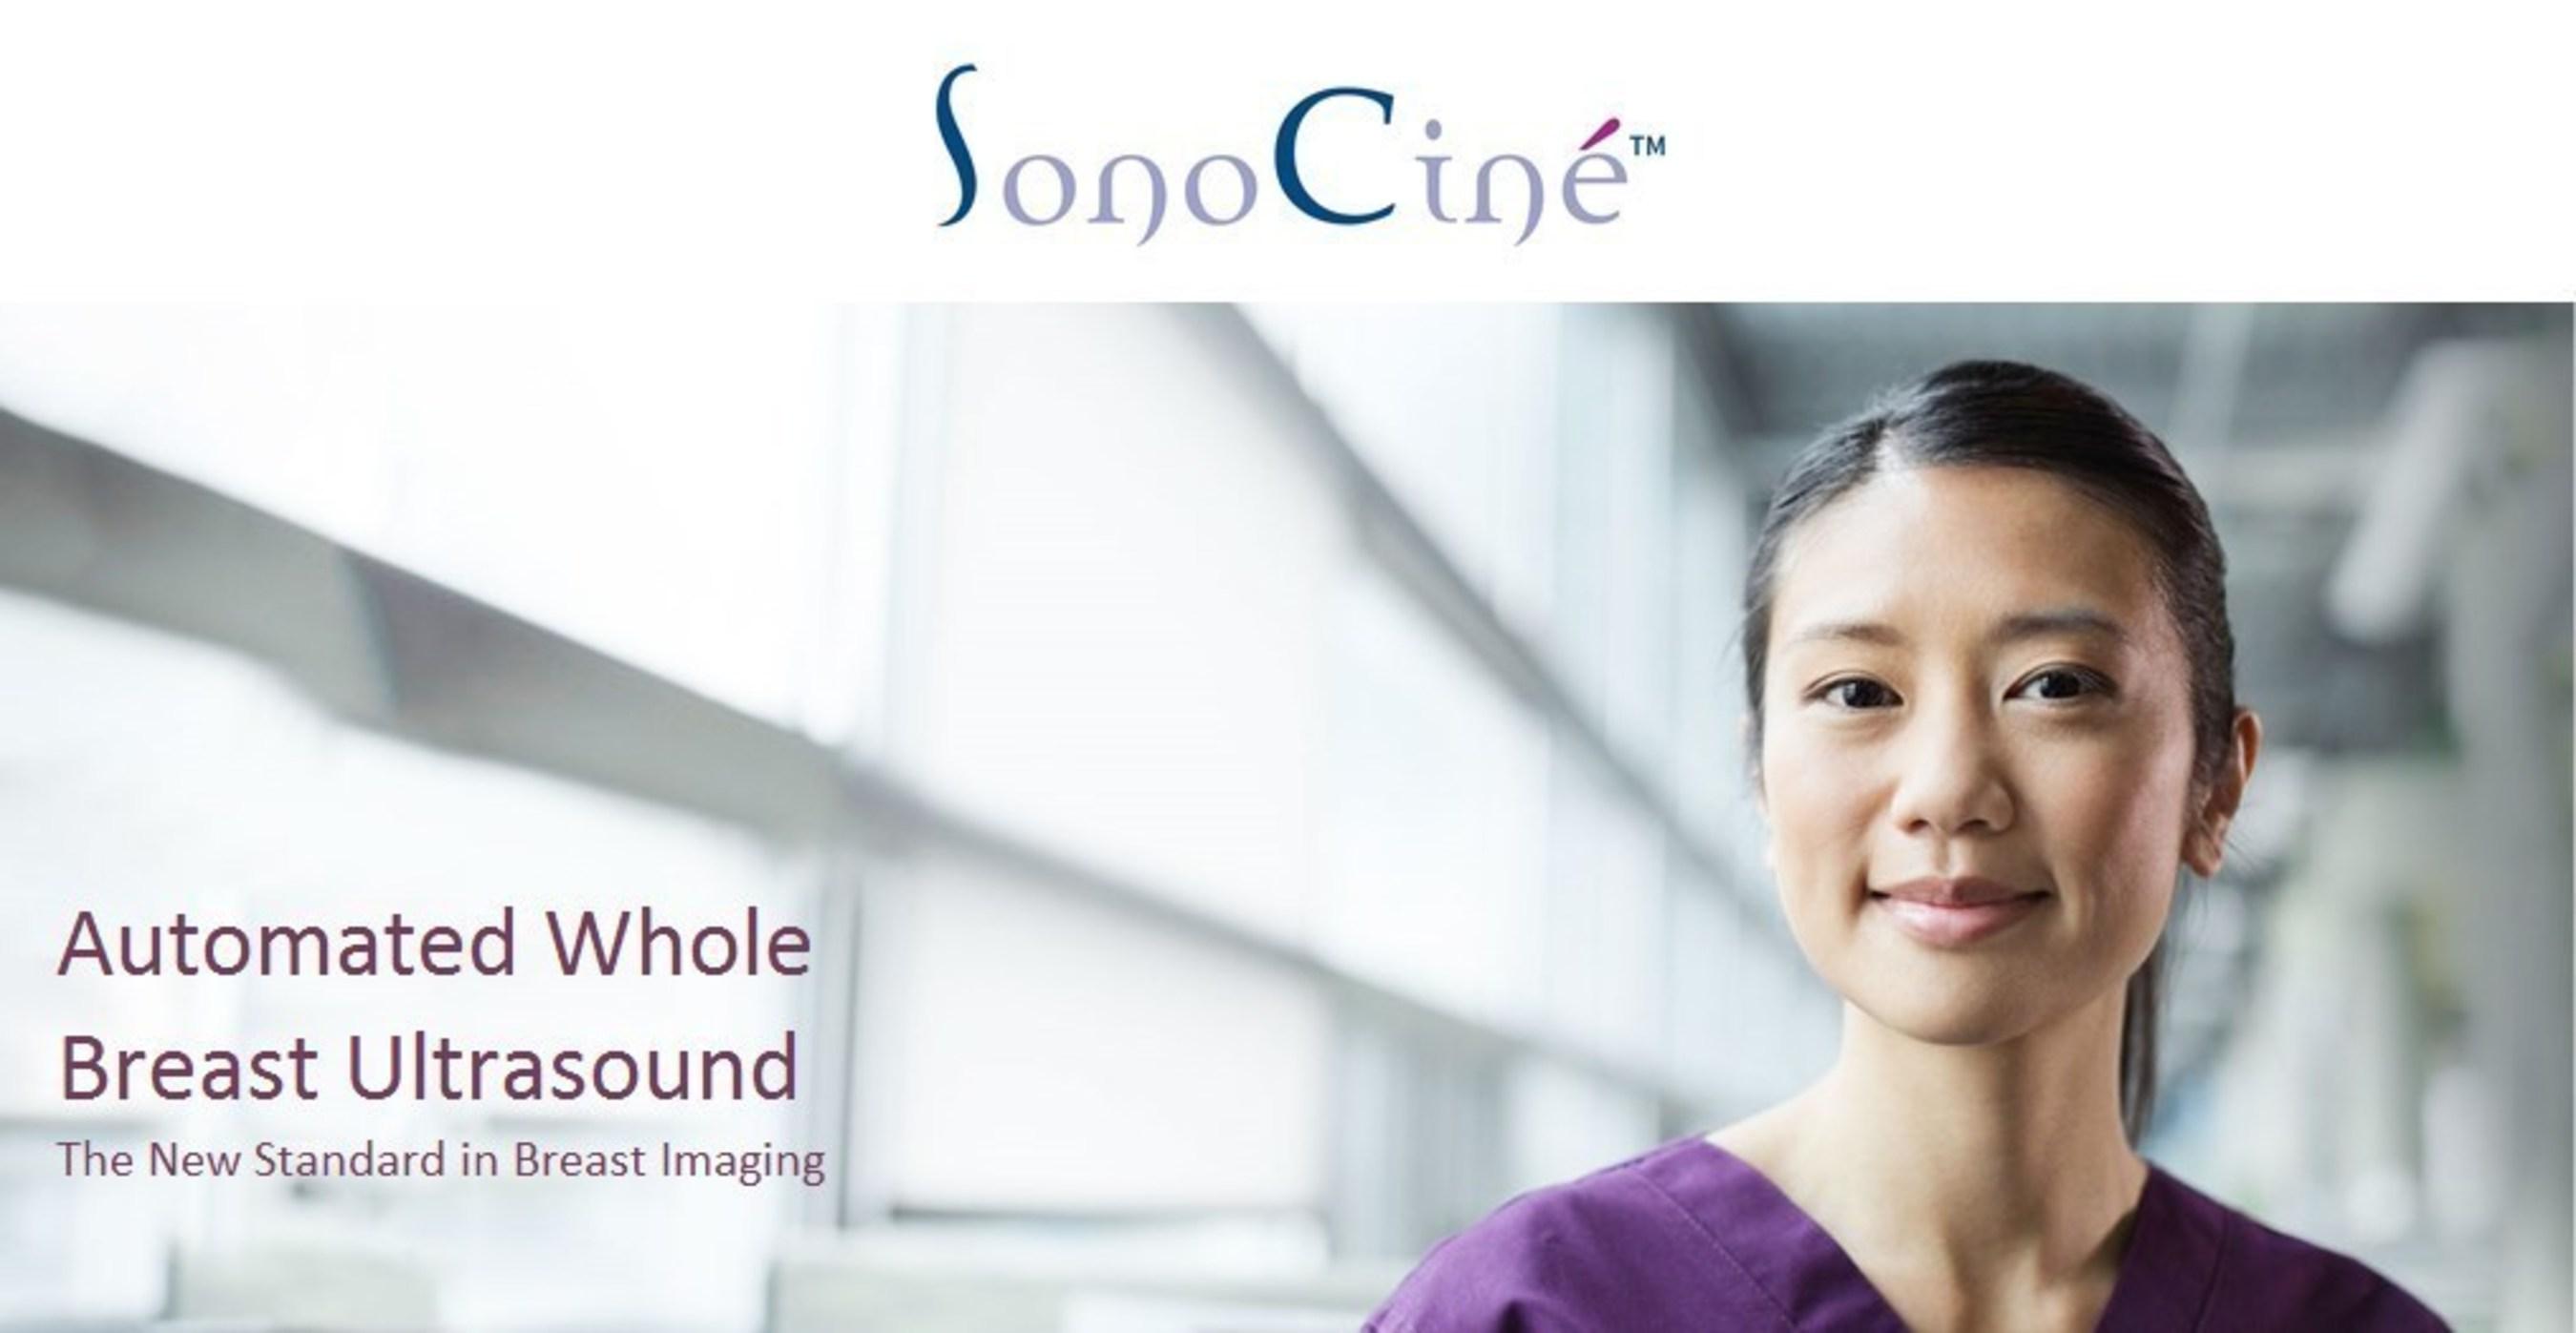 SonoCiné Releases 3D Multiplanar Reconstruction Software to Improve